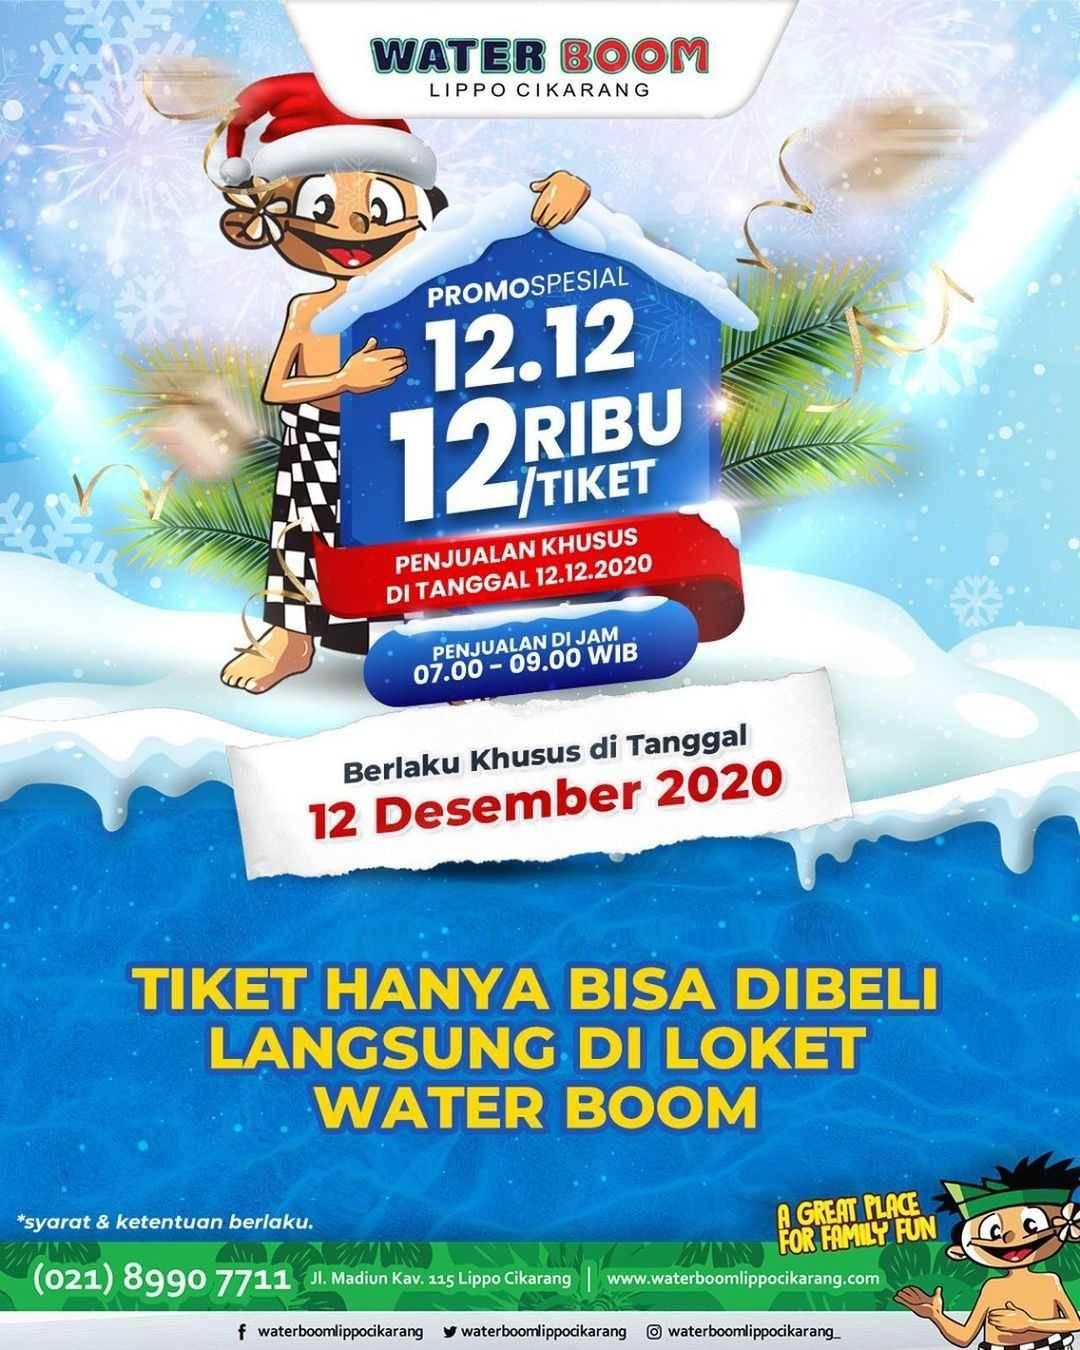 Diskon Waterboom Promo Spesial 12.12 Cuma Rp. 12.000/Tiket